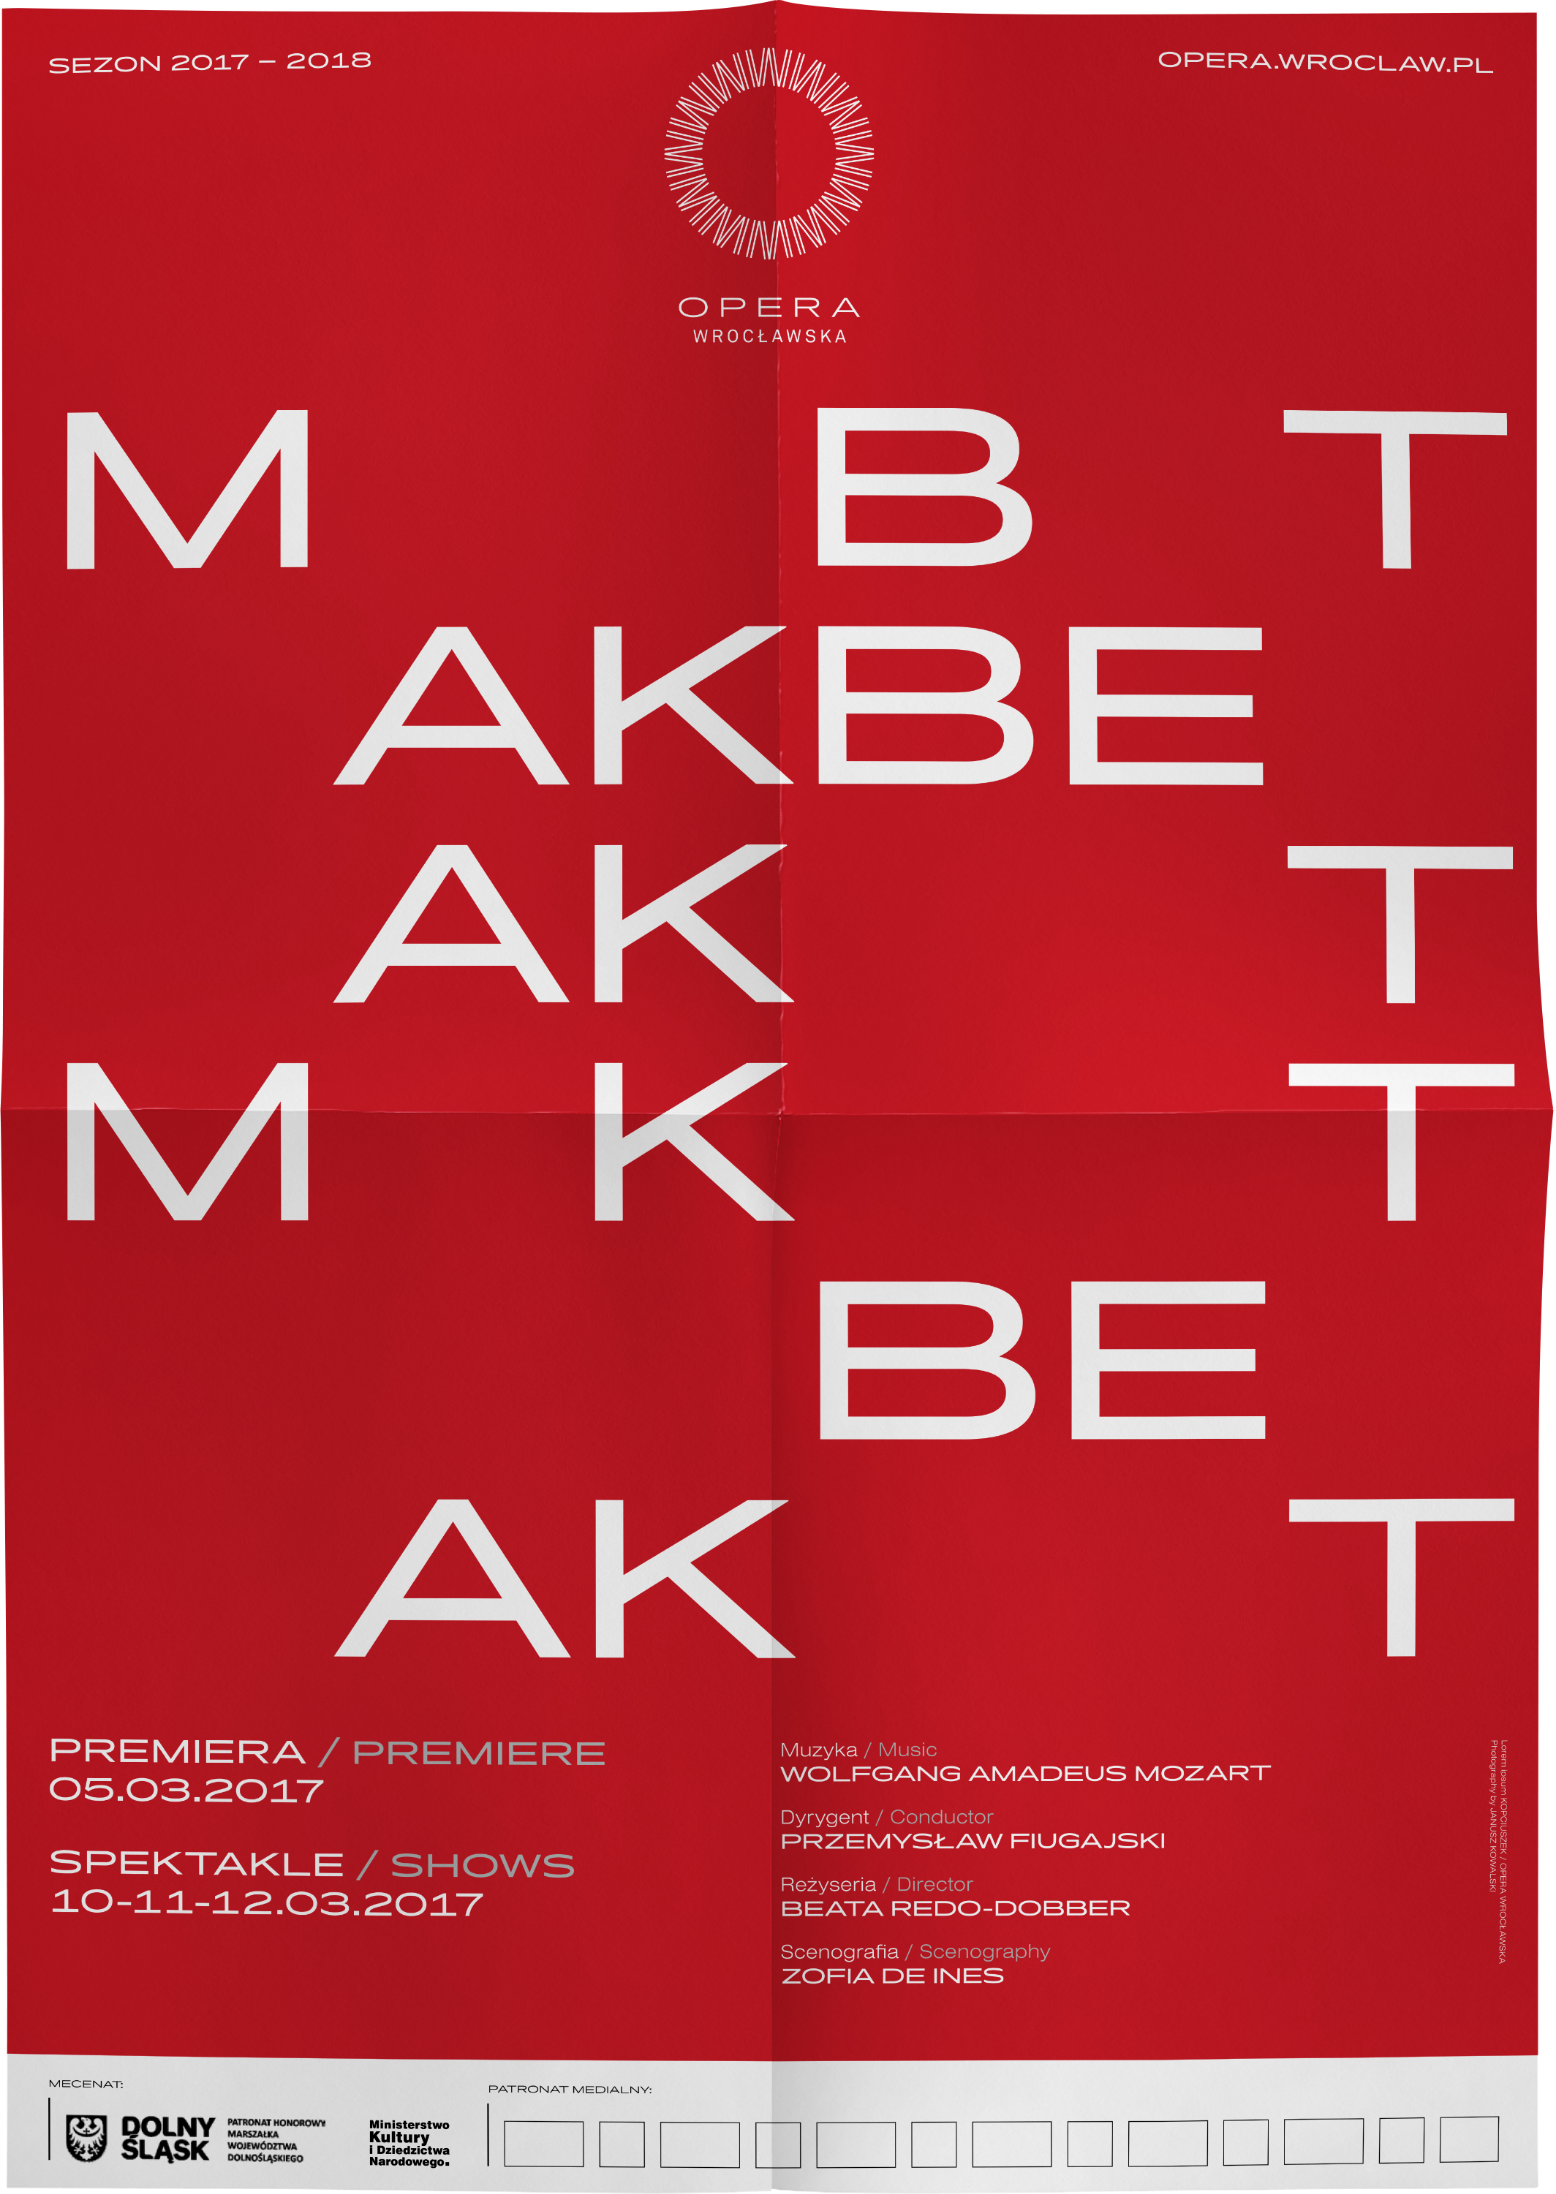 opera-wroclawska-branding-7